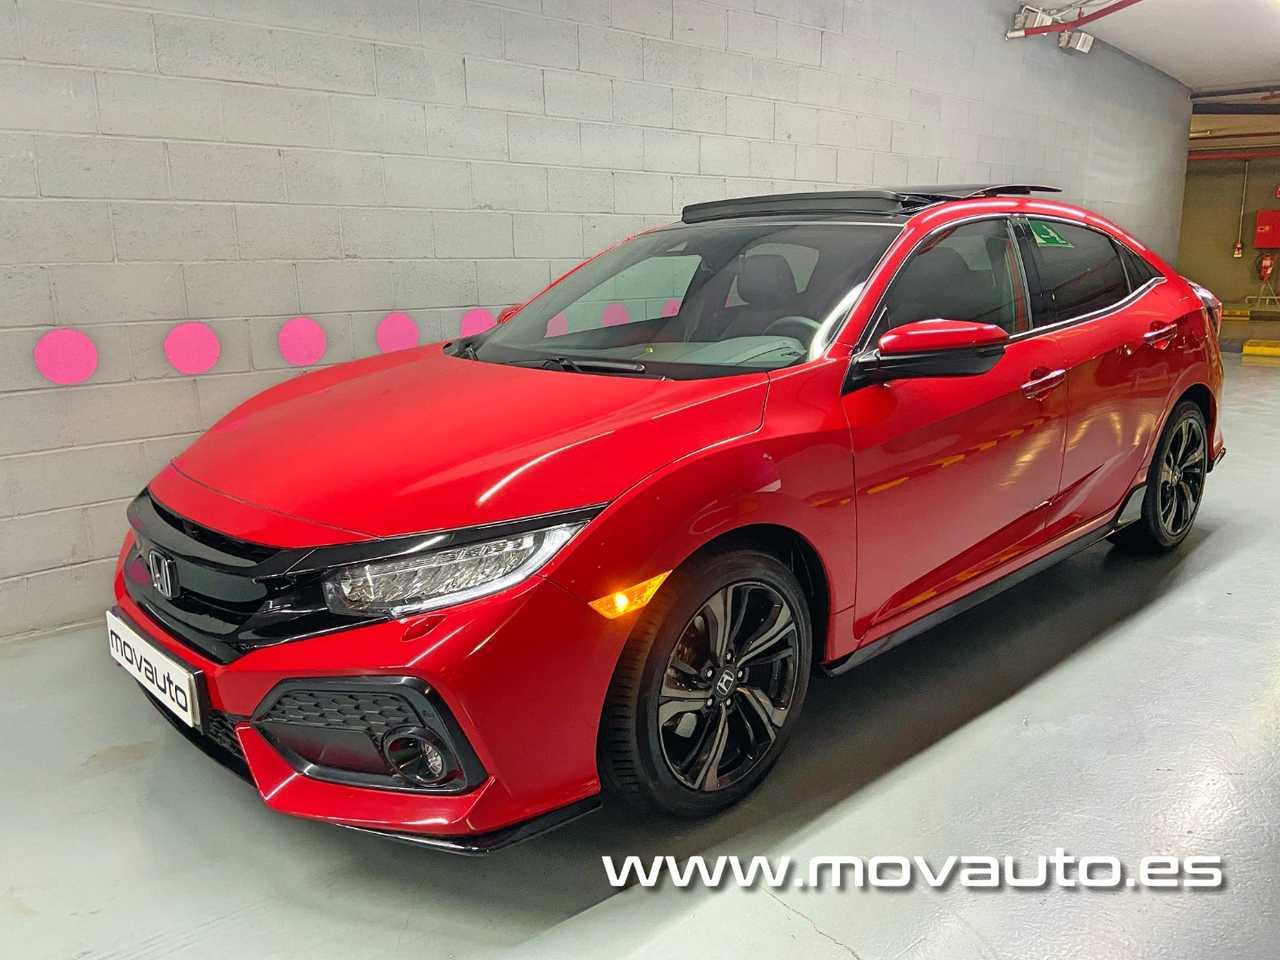 Honda Civic 1.5 Turbo 182cv SPORT PLUS   - Foto 1